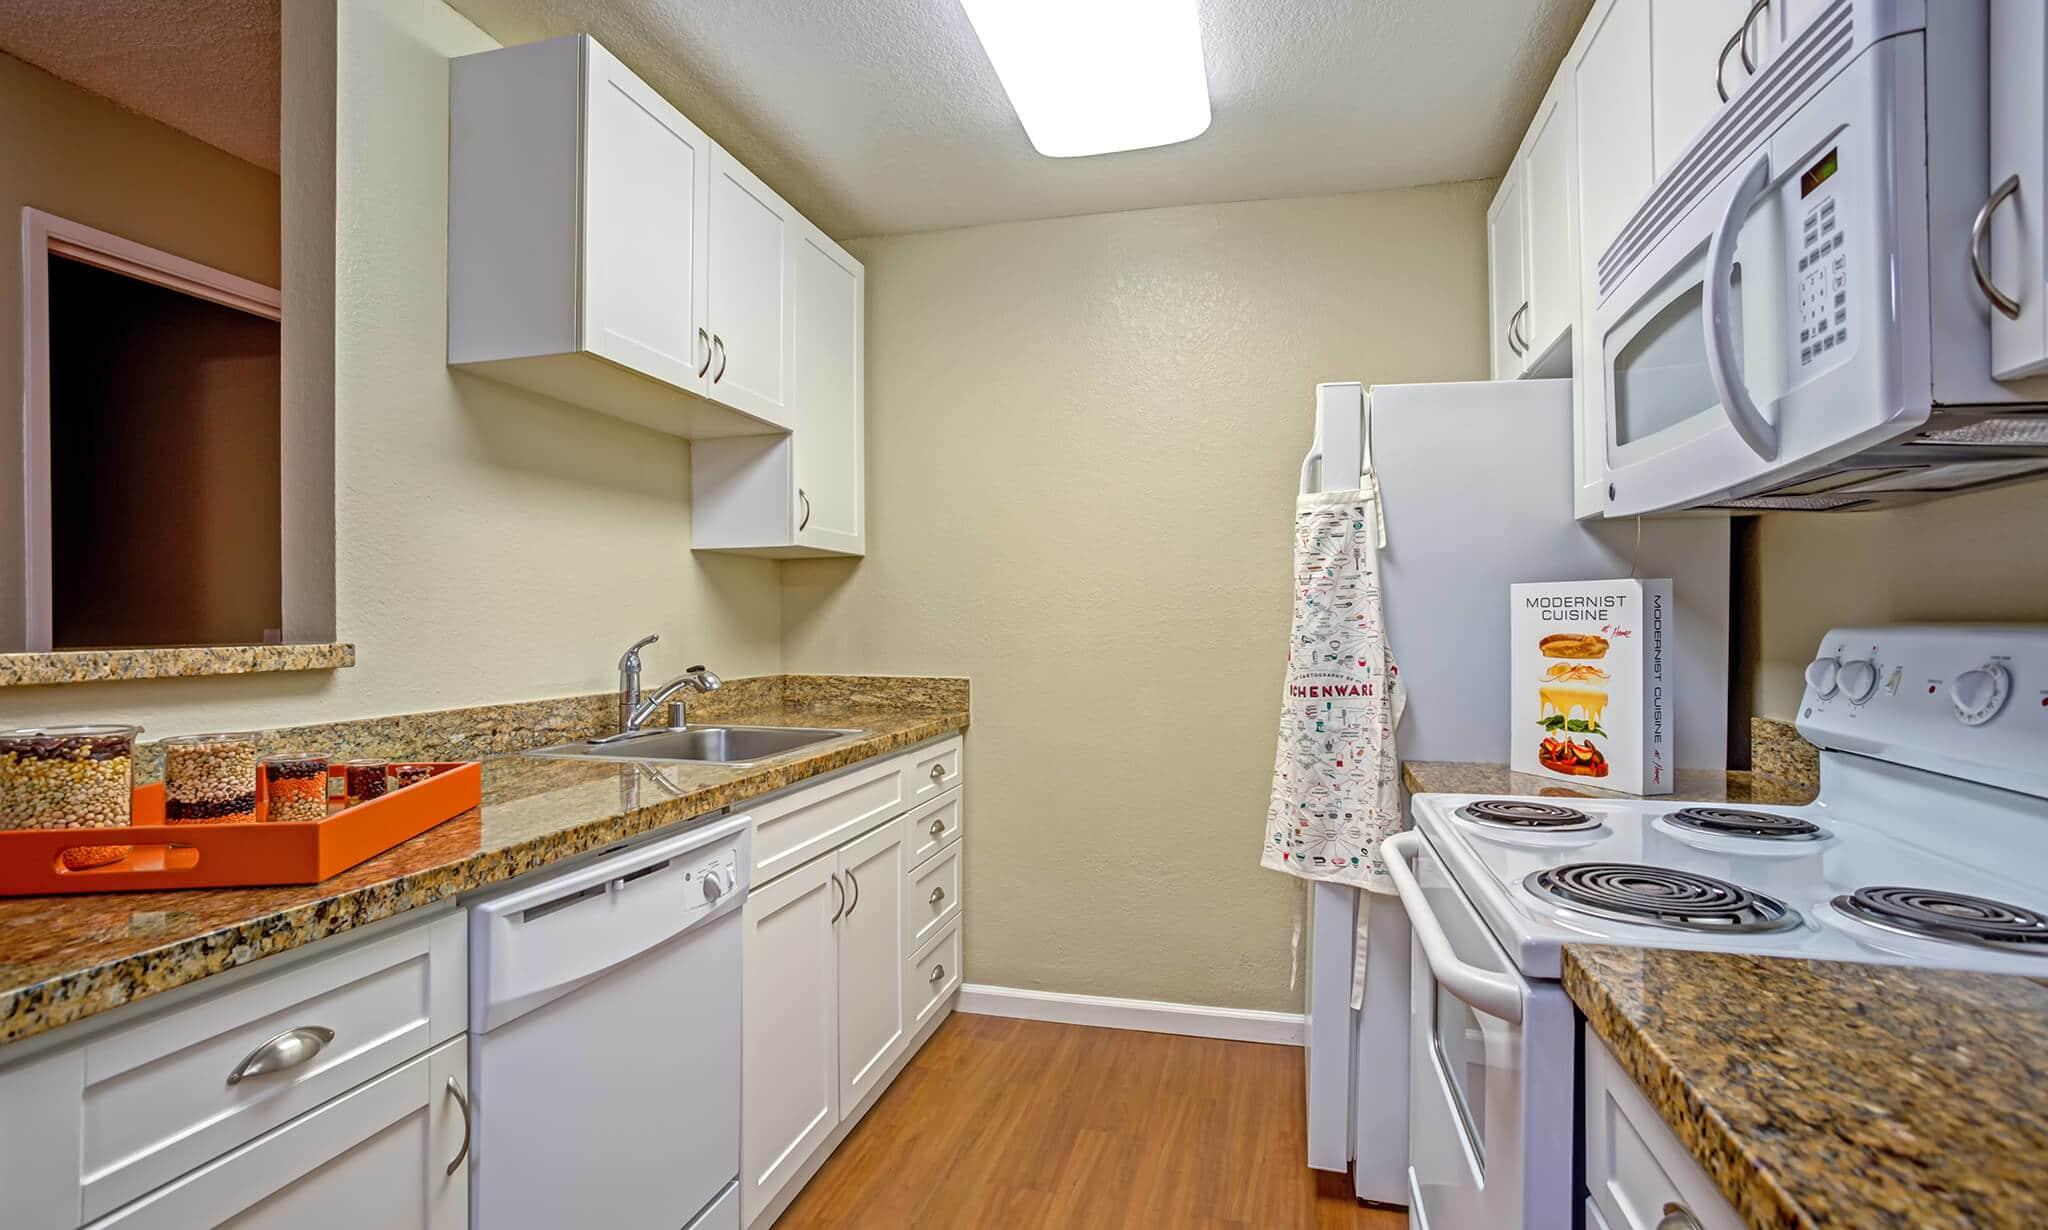 Orchard Glen Apartments apartments in Santa Clara CA to rent photo 7